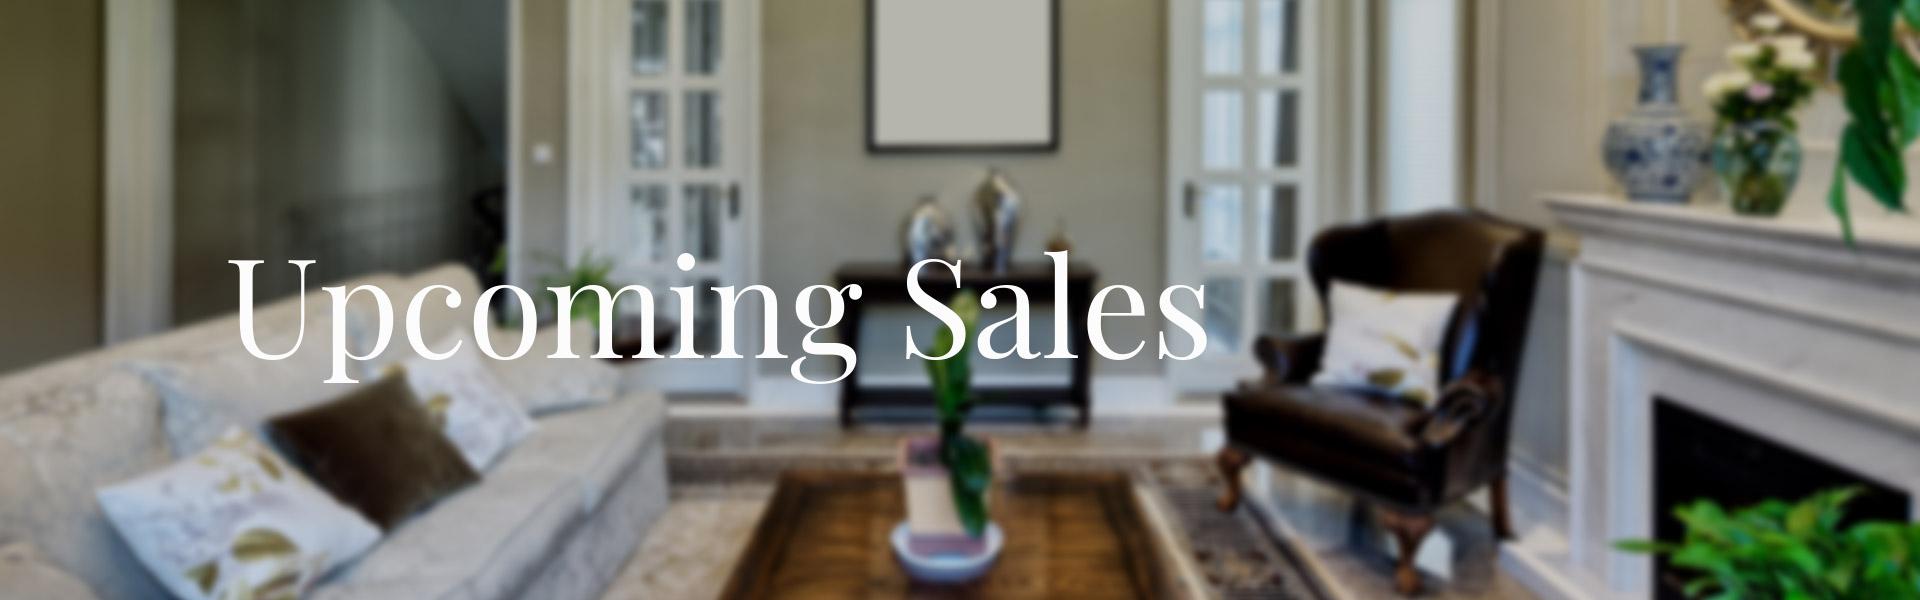 michael_taylor_estate_sales_upcoming_sales_header_room